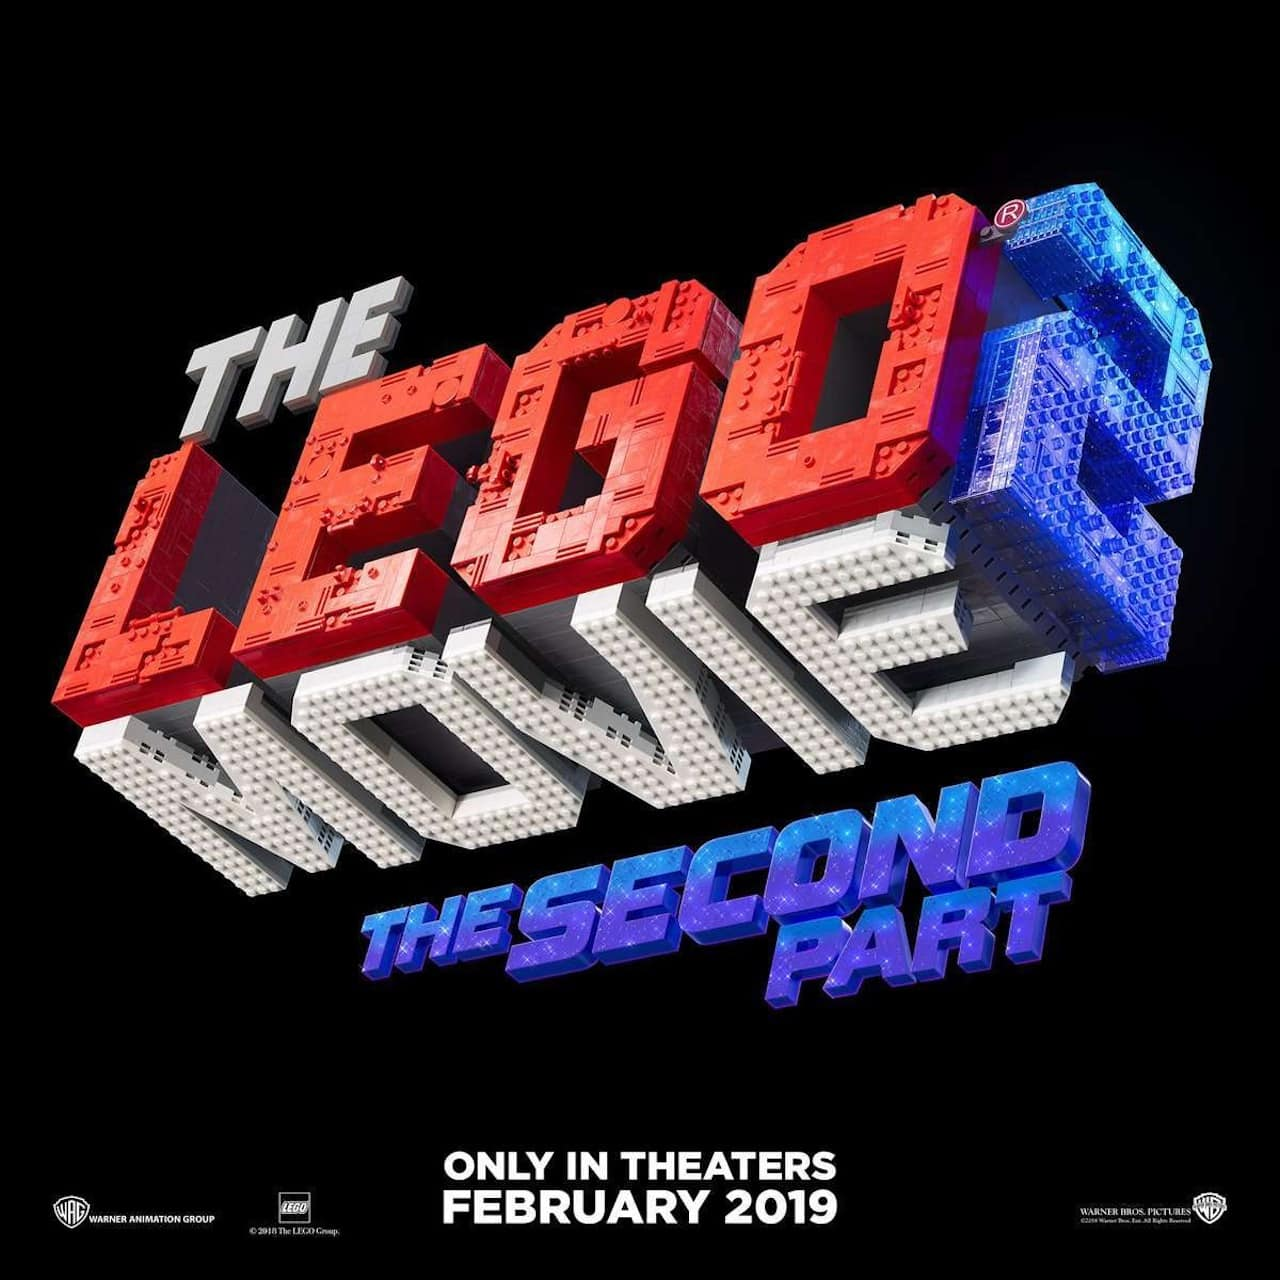 The LEGO Movie 2: The Second Part arriverà nel 2019